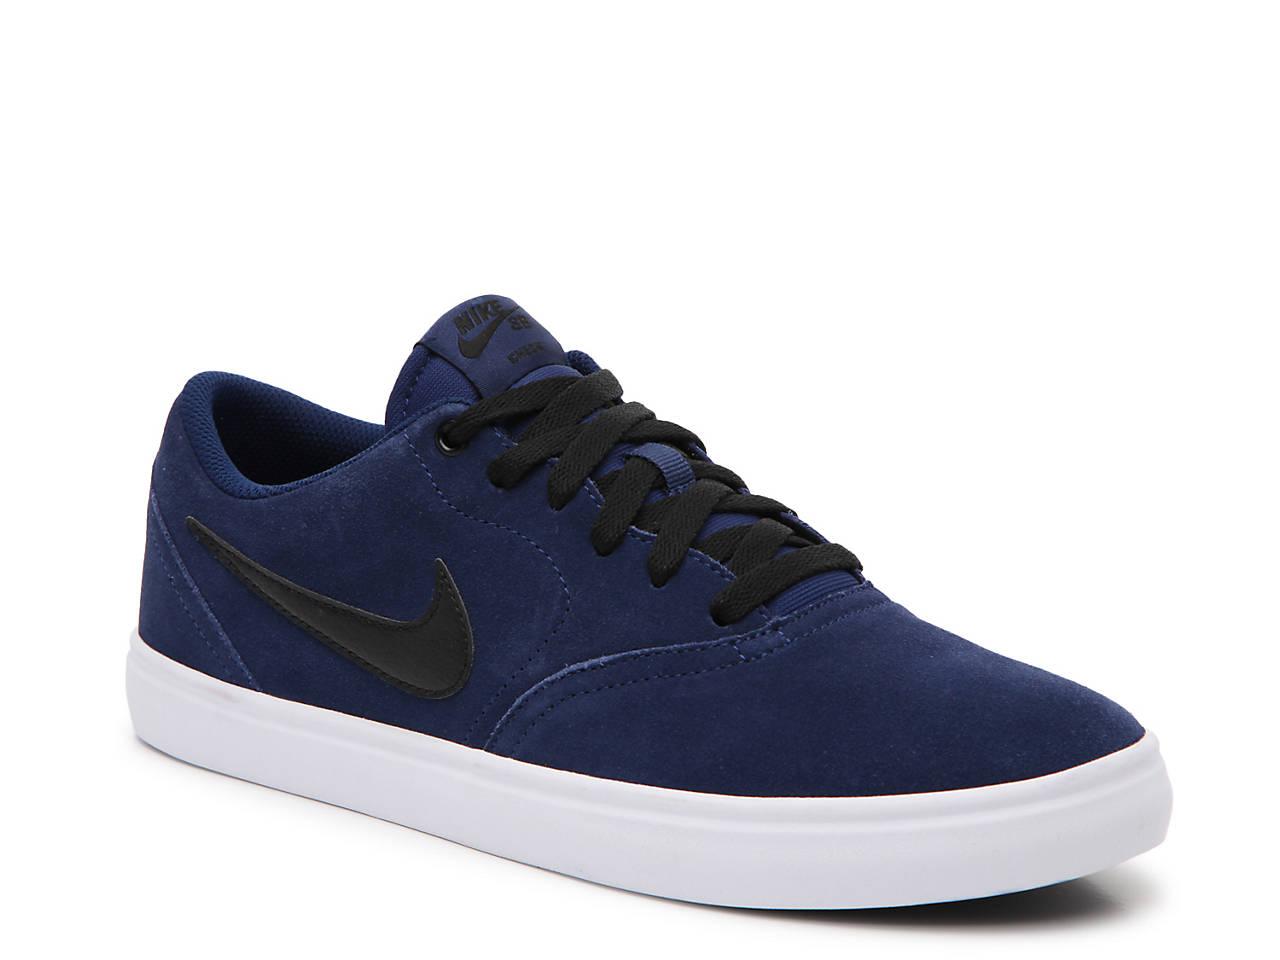 new product 9a907 b66f8 Nike SB Check Premium Solarsoft Sneaker - Men's Men's Shoes   DSW